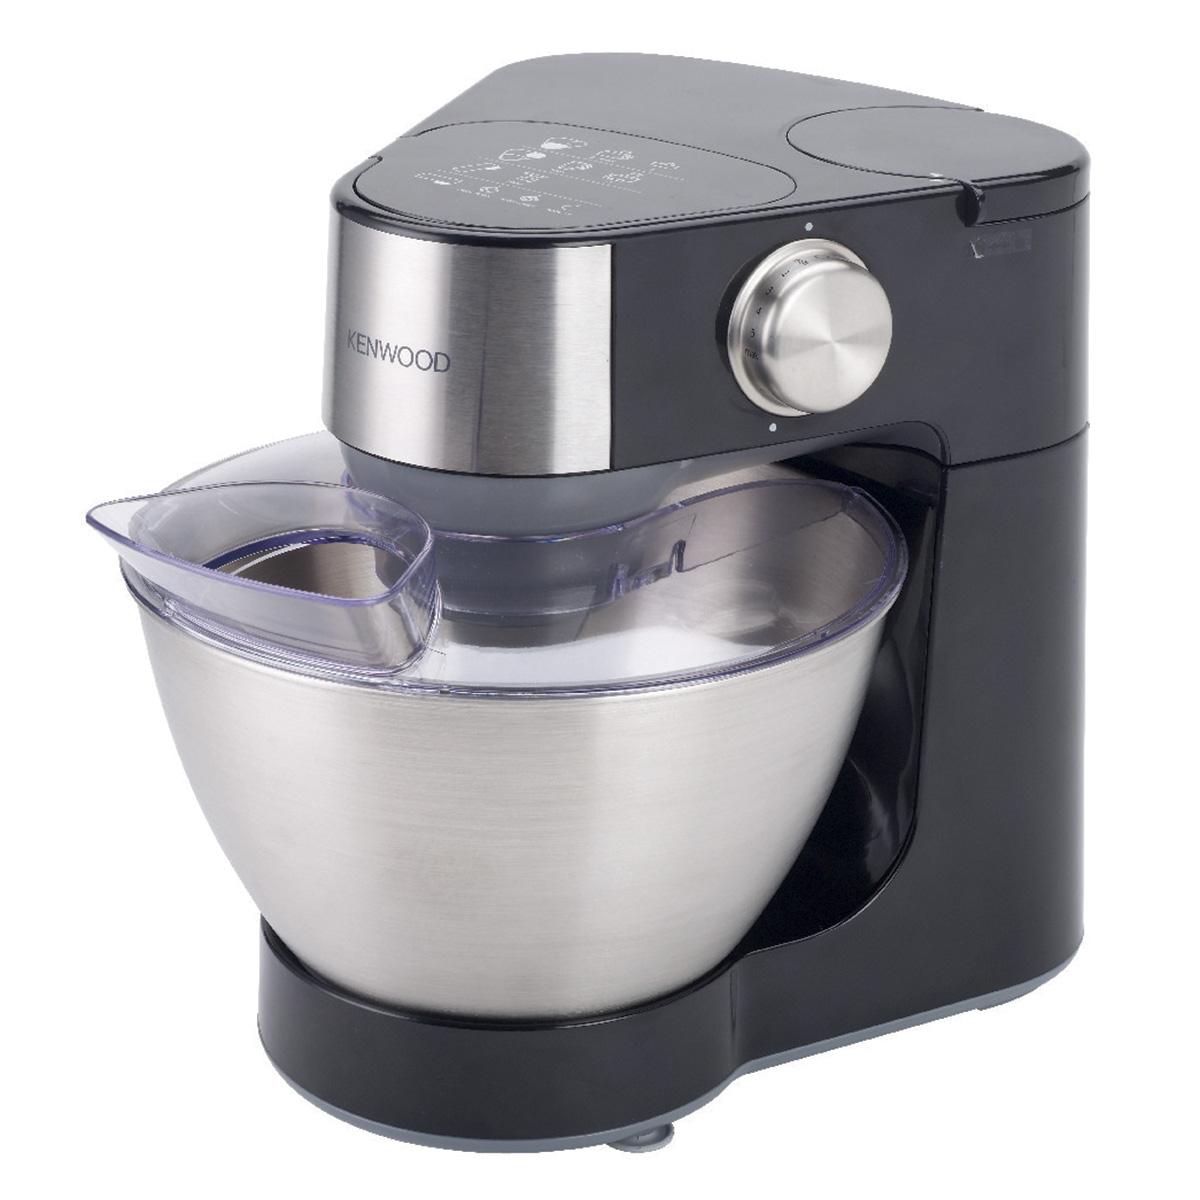 Kenwood køkkenmaskine - Prospero KM289